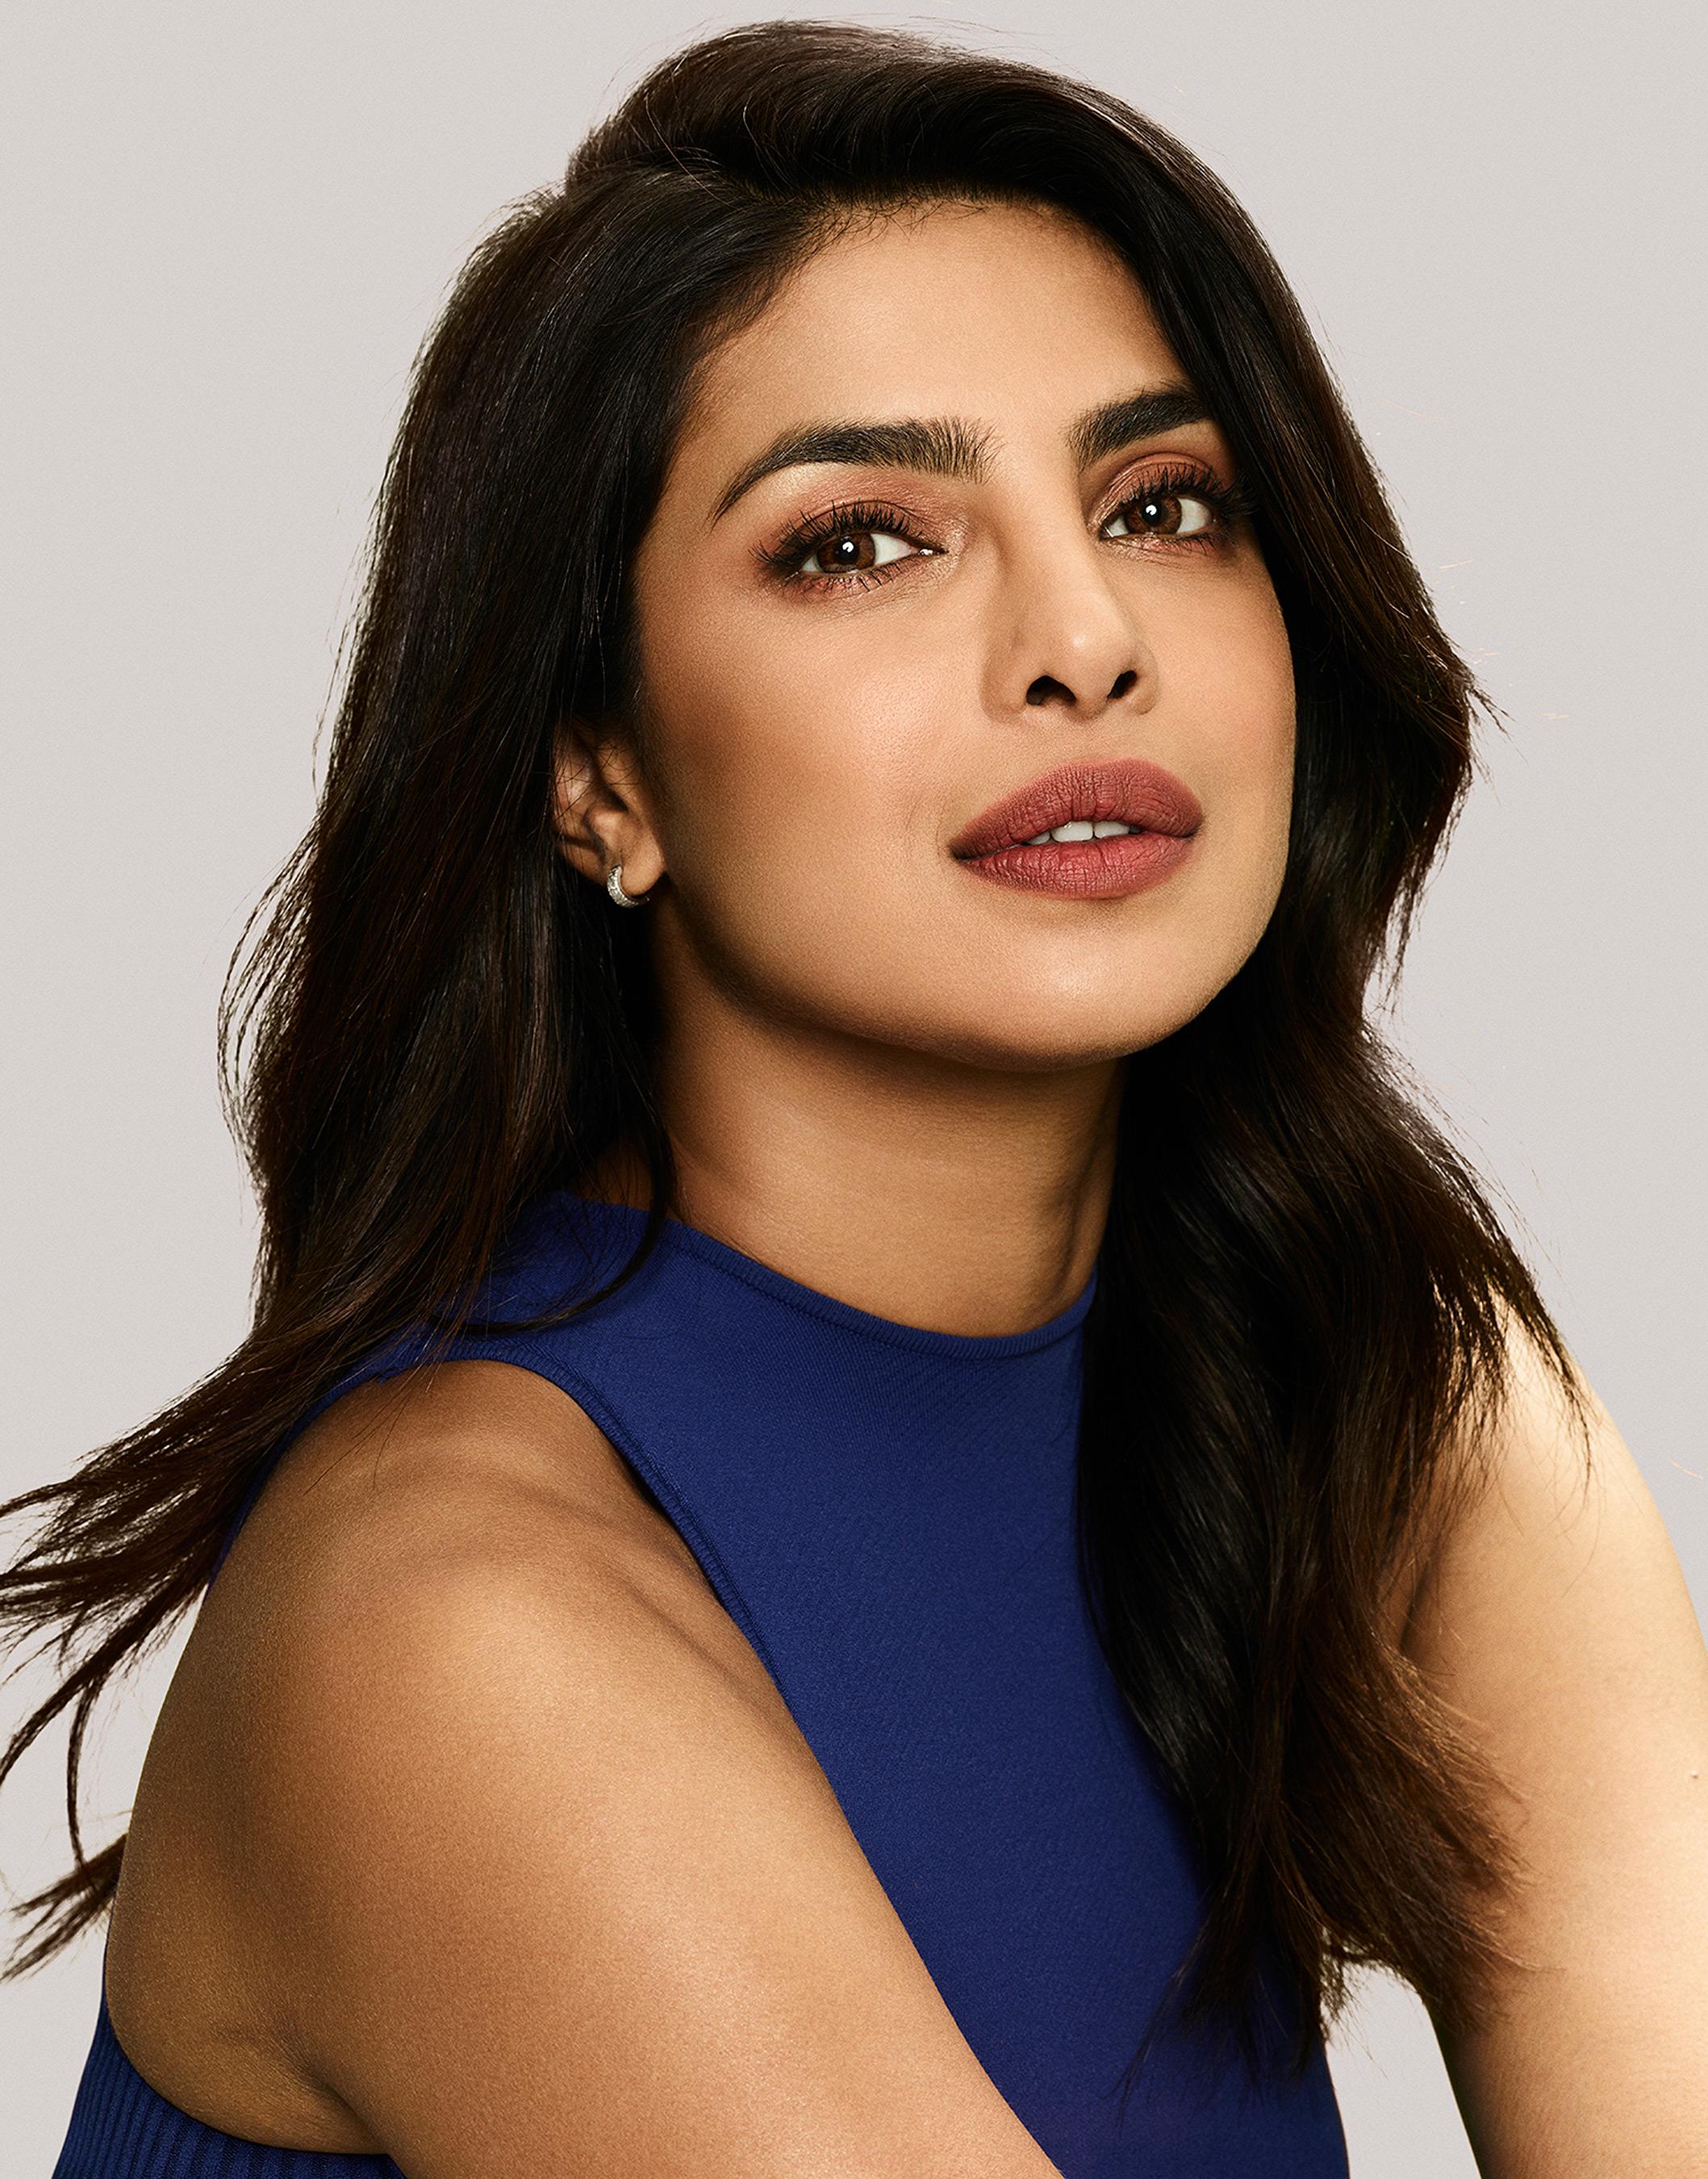 Priyanka Chopra fronts skin care brand Obagis new campaign 2117x2700